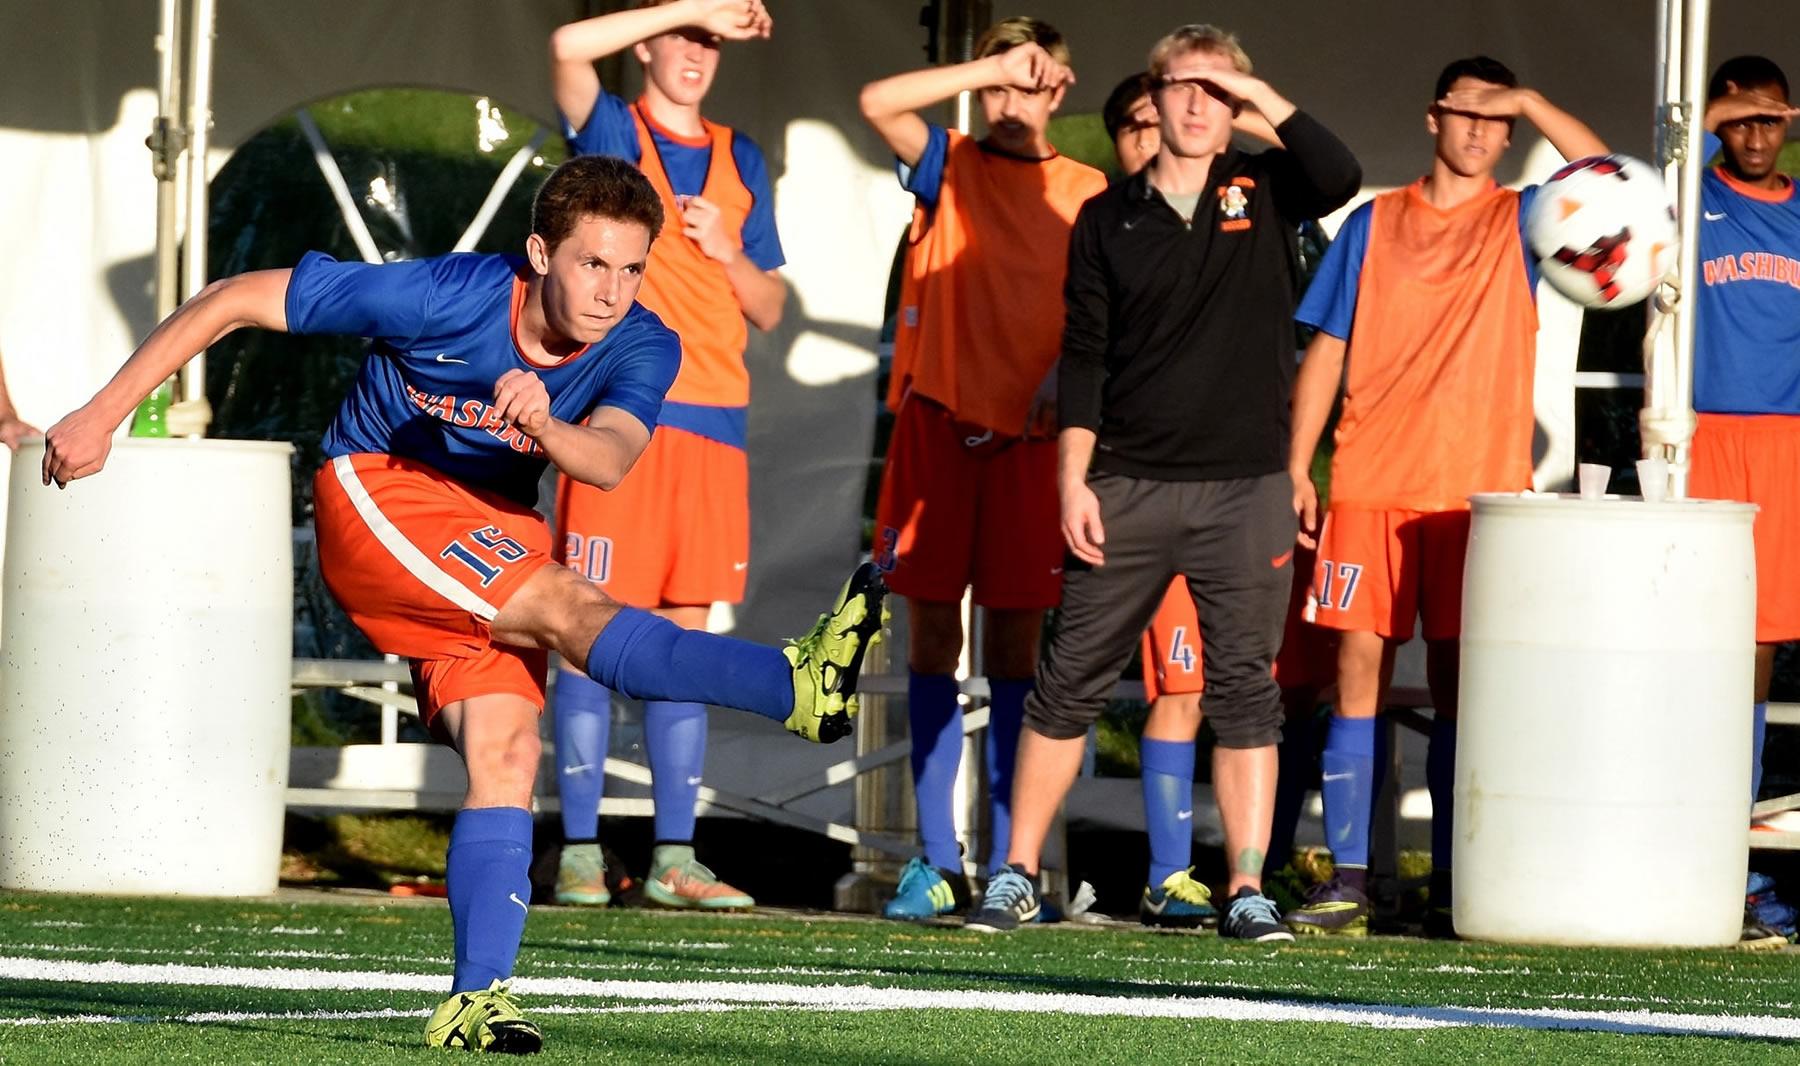 Washburn varsity soccer player Max Lindemann state tournament